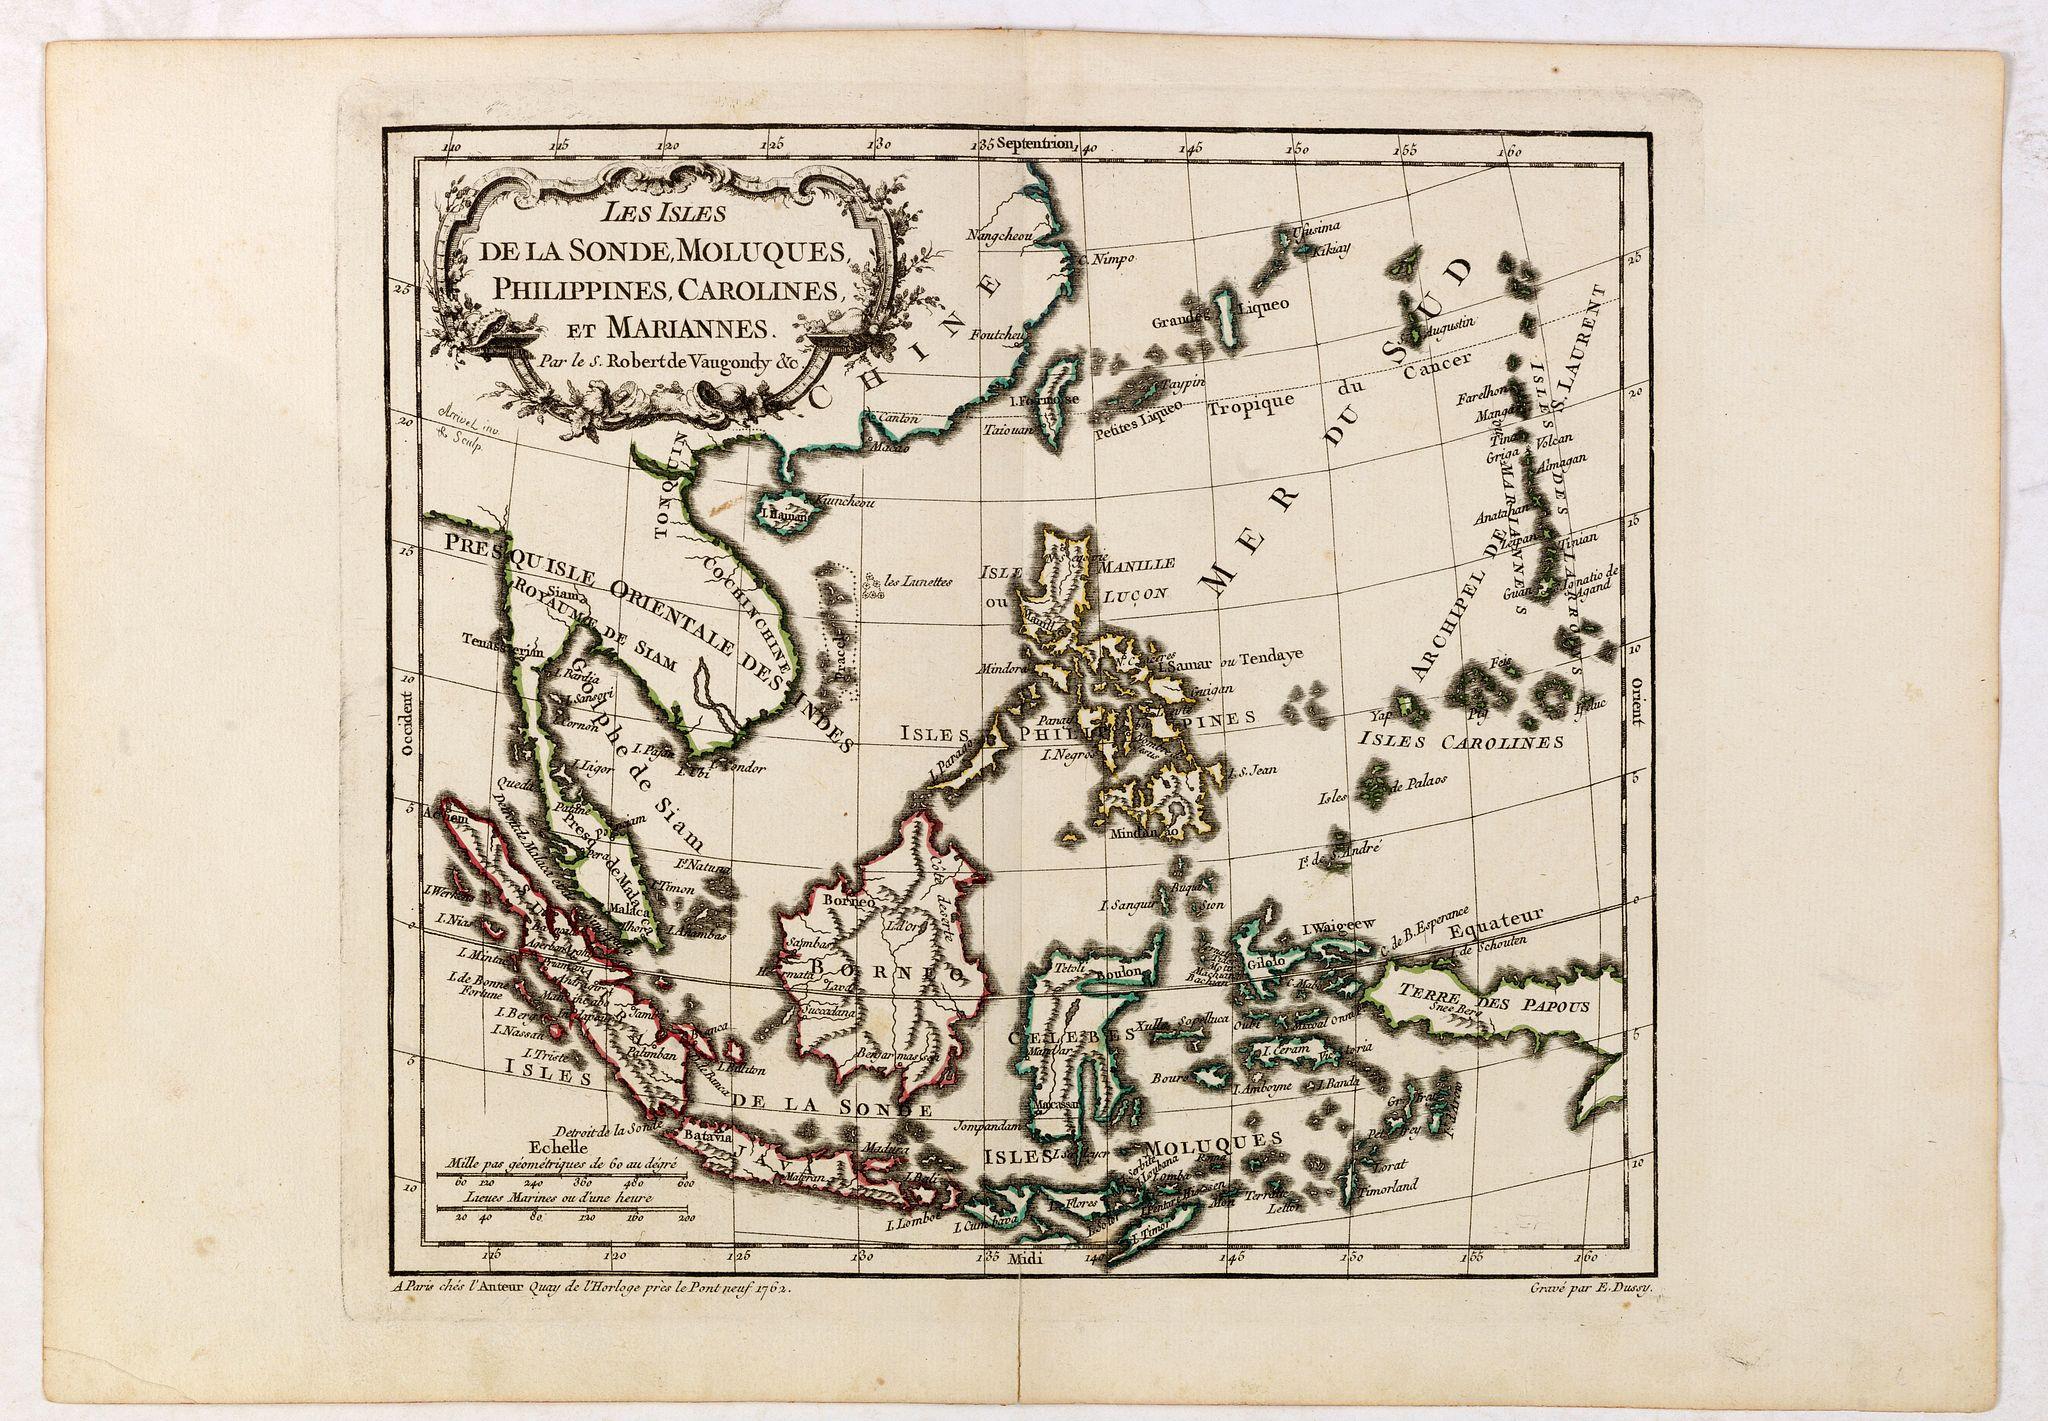 VAUGONDY, R. de -  Les Isles de la Sonde, Moluques, Philippines, Carolines, et Marlannes.